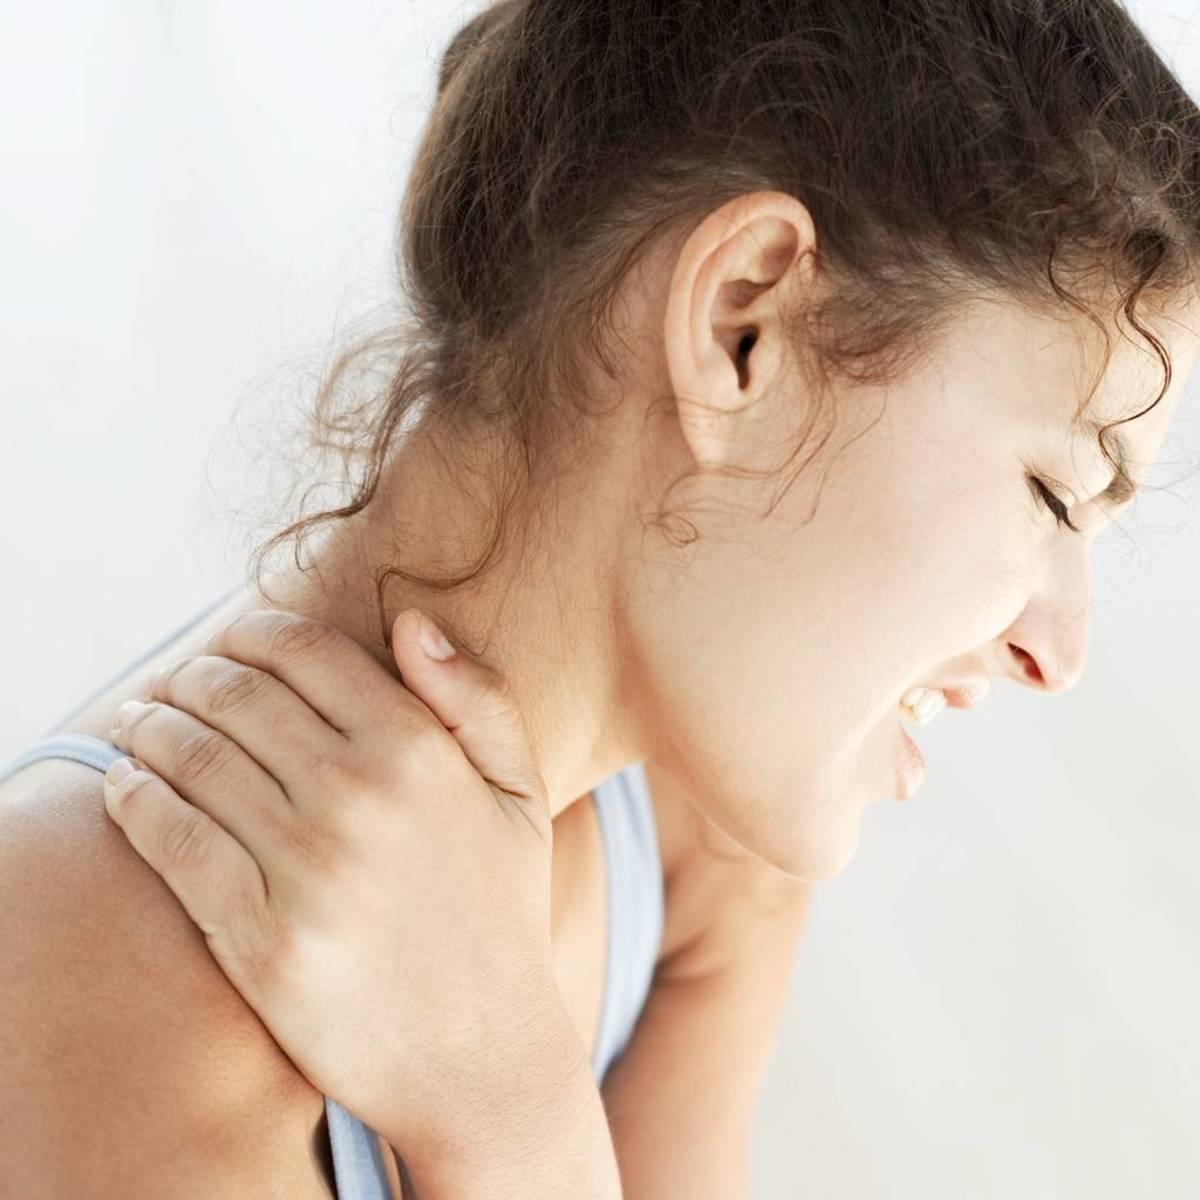 Care Plan: Nursing Interventions for Acute Pain, NANDA